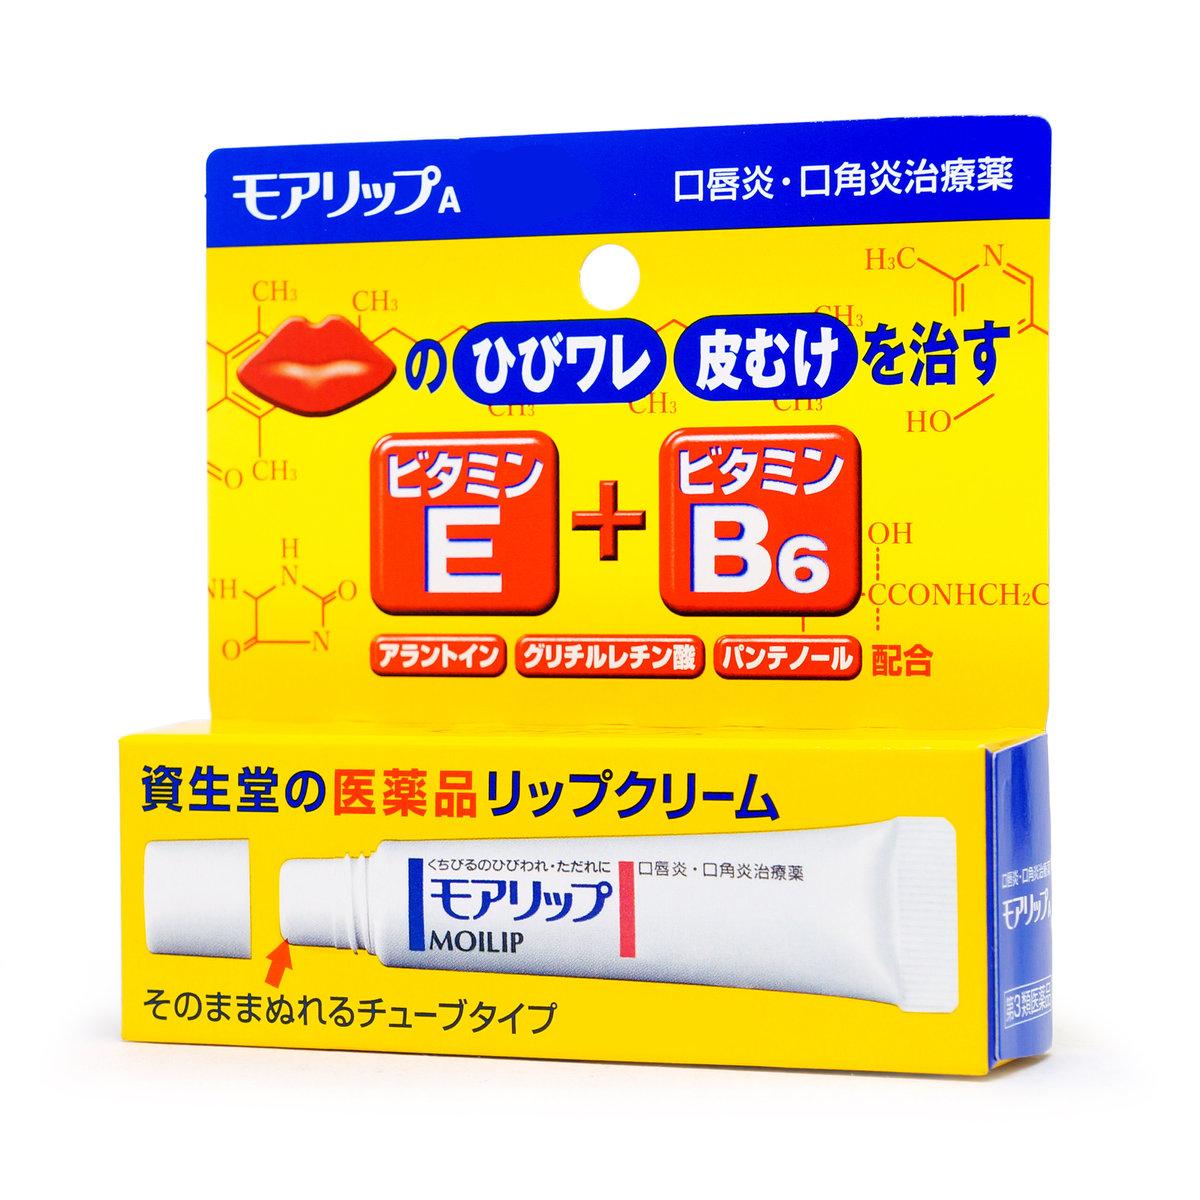 【過敏/唇炎必試】No.1 Shishedo 資生堂 Moilip E + B6 藥用潤唇膏 8g ~$50-60